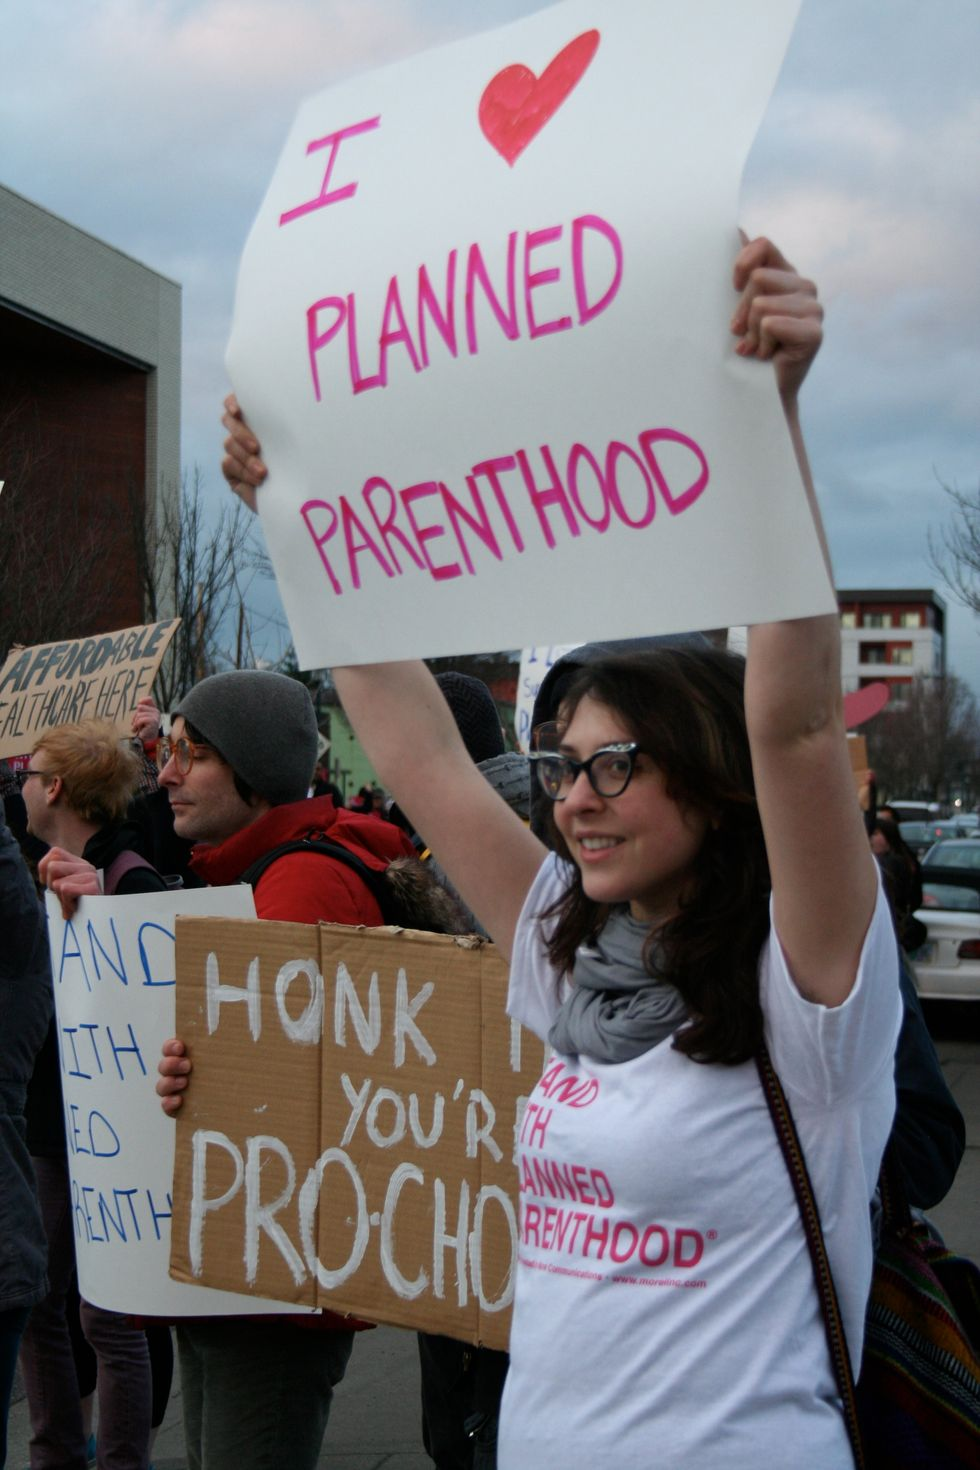 Let's Talk About Planned Parenthood